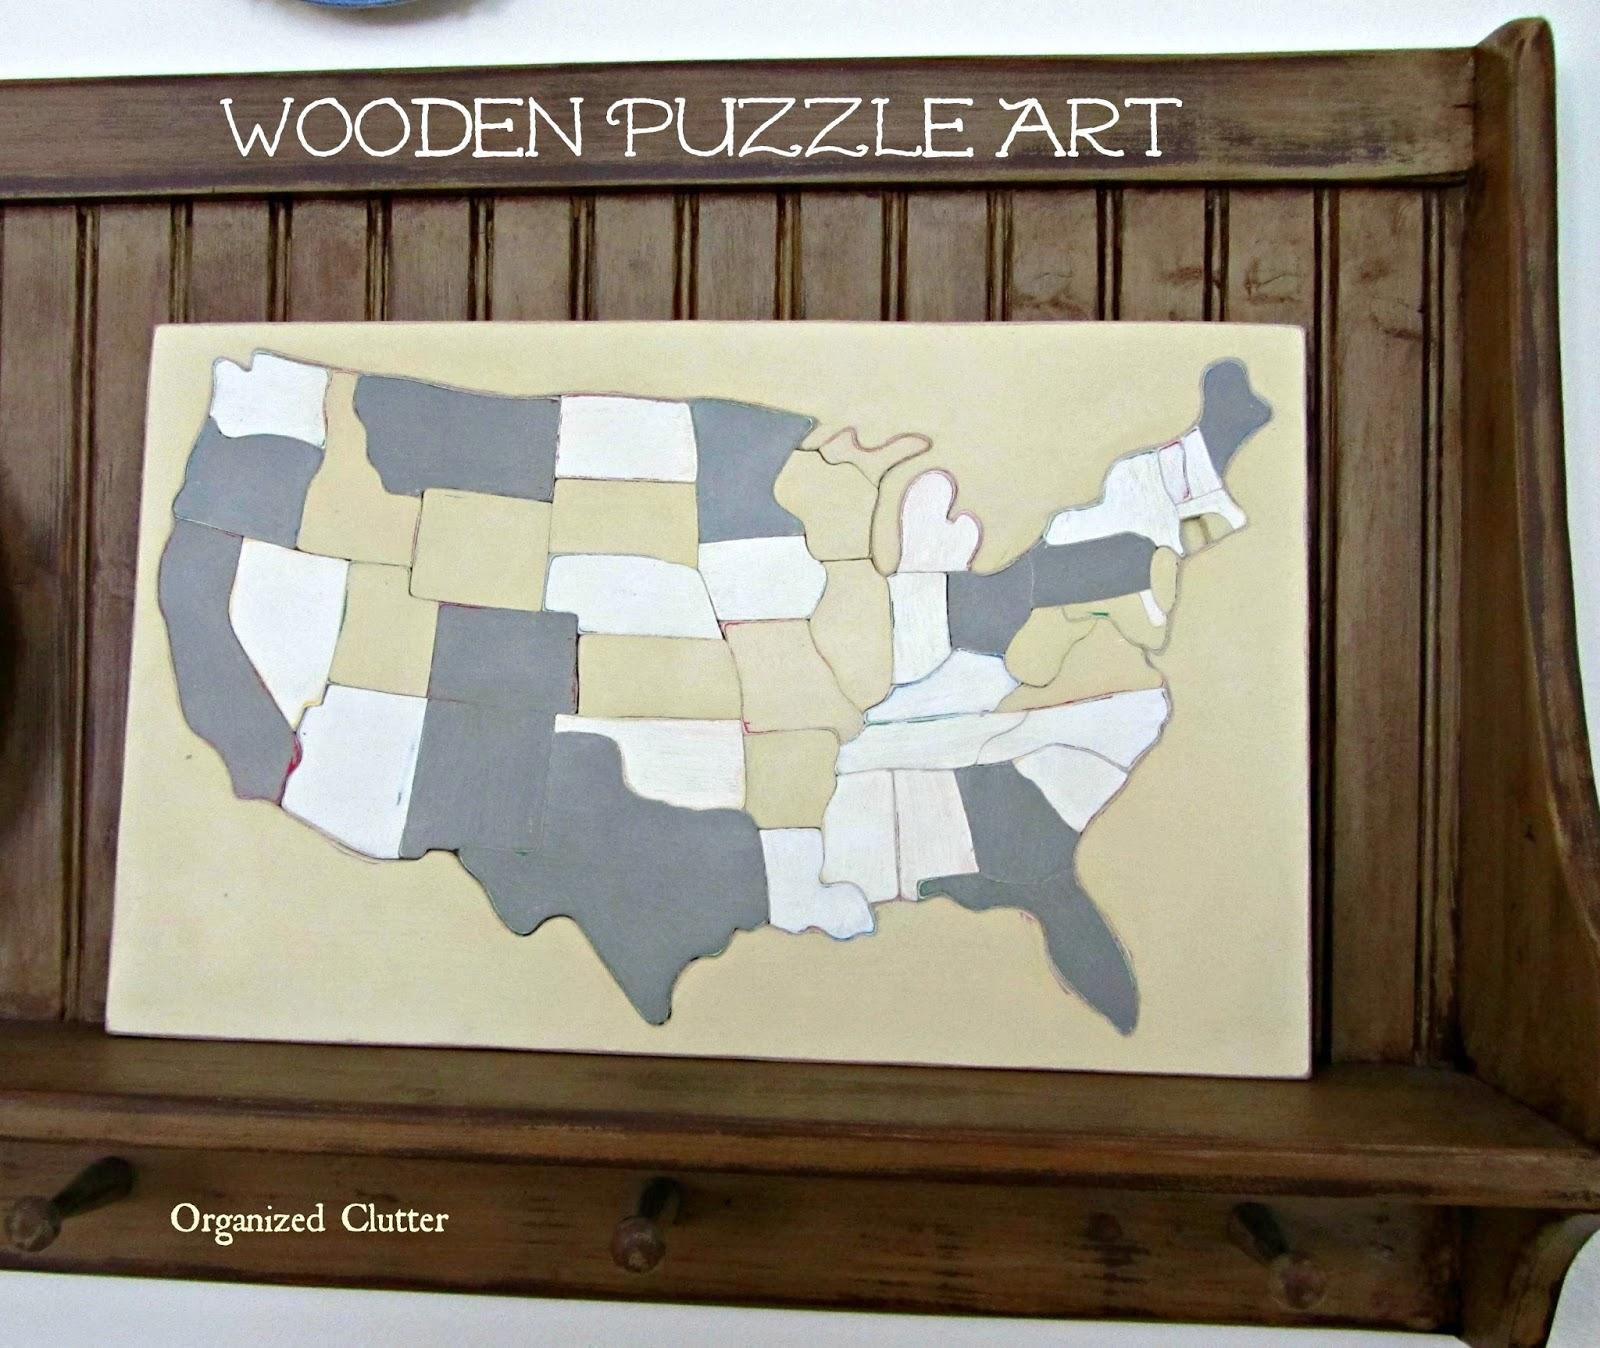 Vintage Wood Puzzle Art Organized Clutter